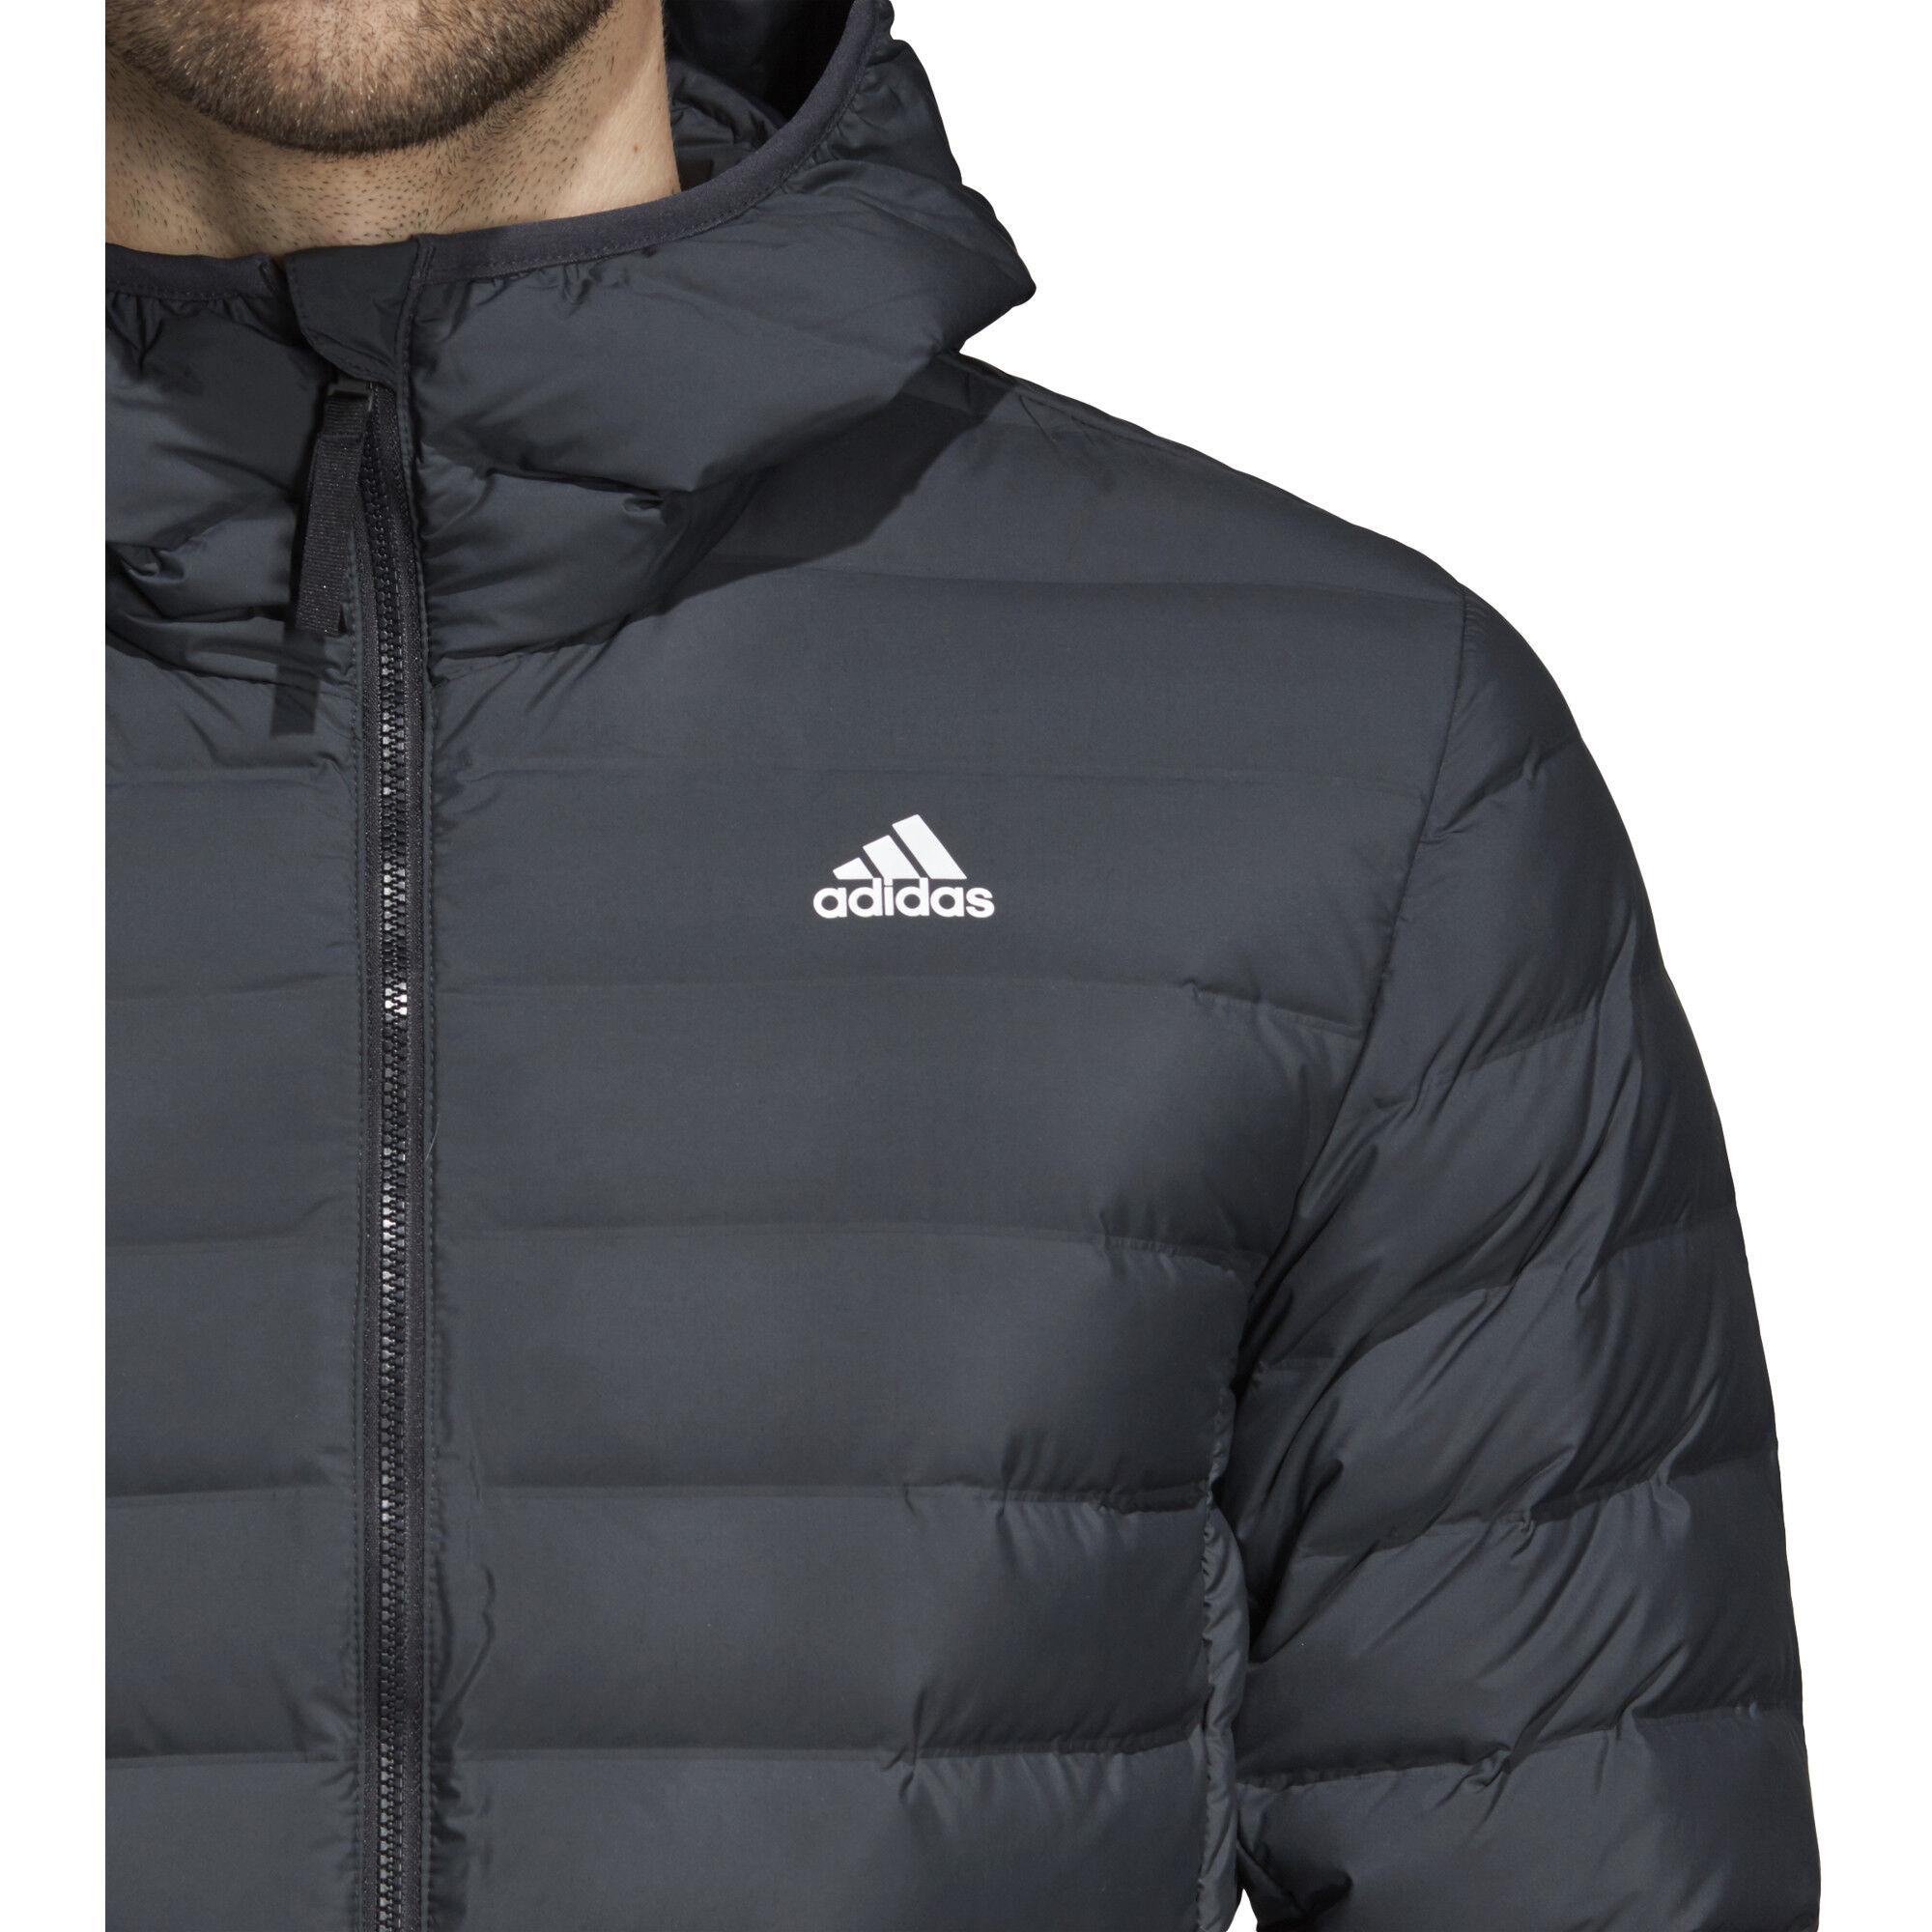 adidas blocked daunenjacke farbe schwarz